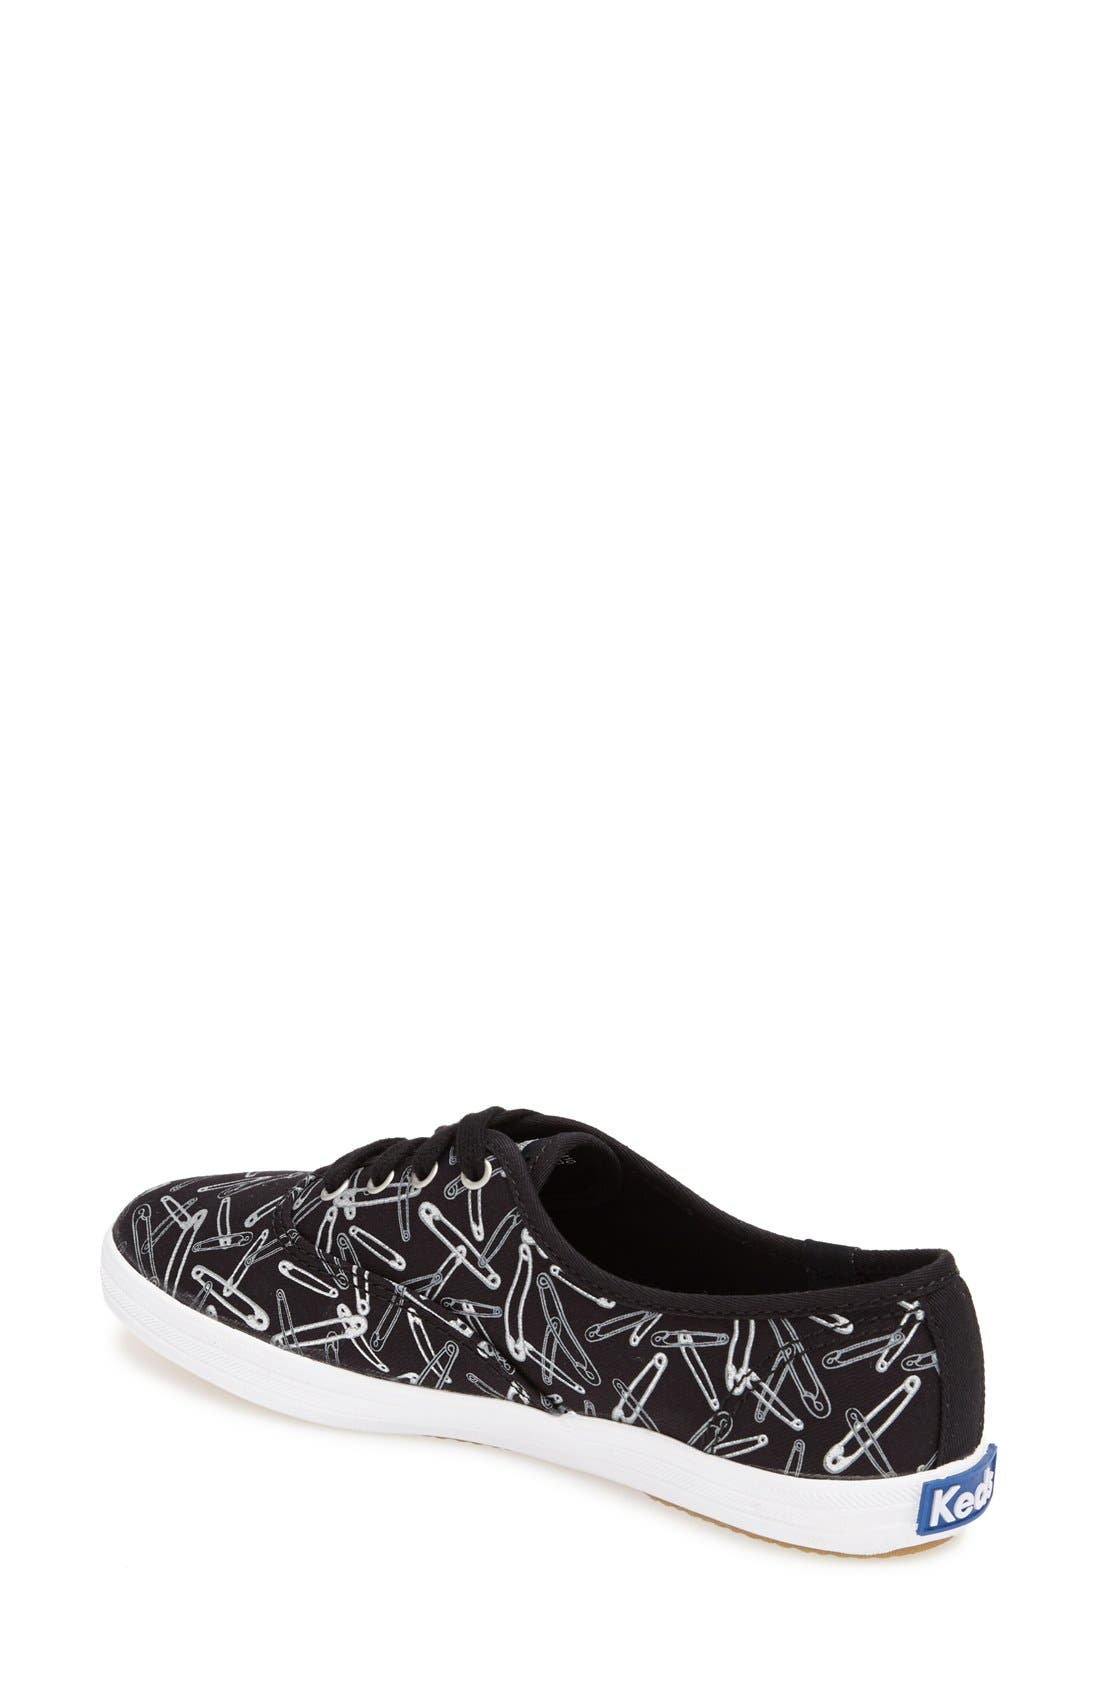 Alternate Image 2  - Keds® 'Champion - Pins' Sneaker (Women)